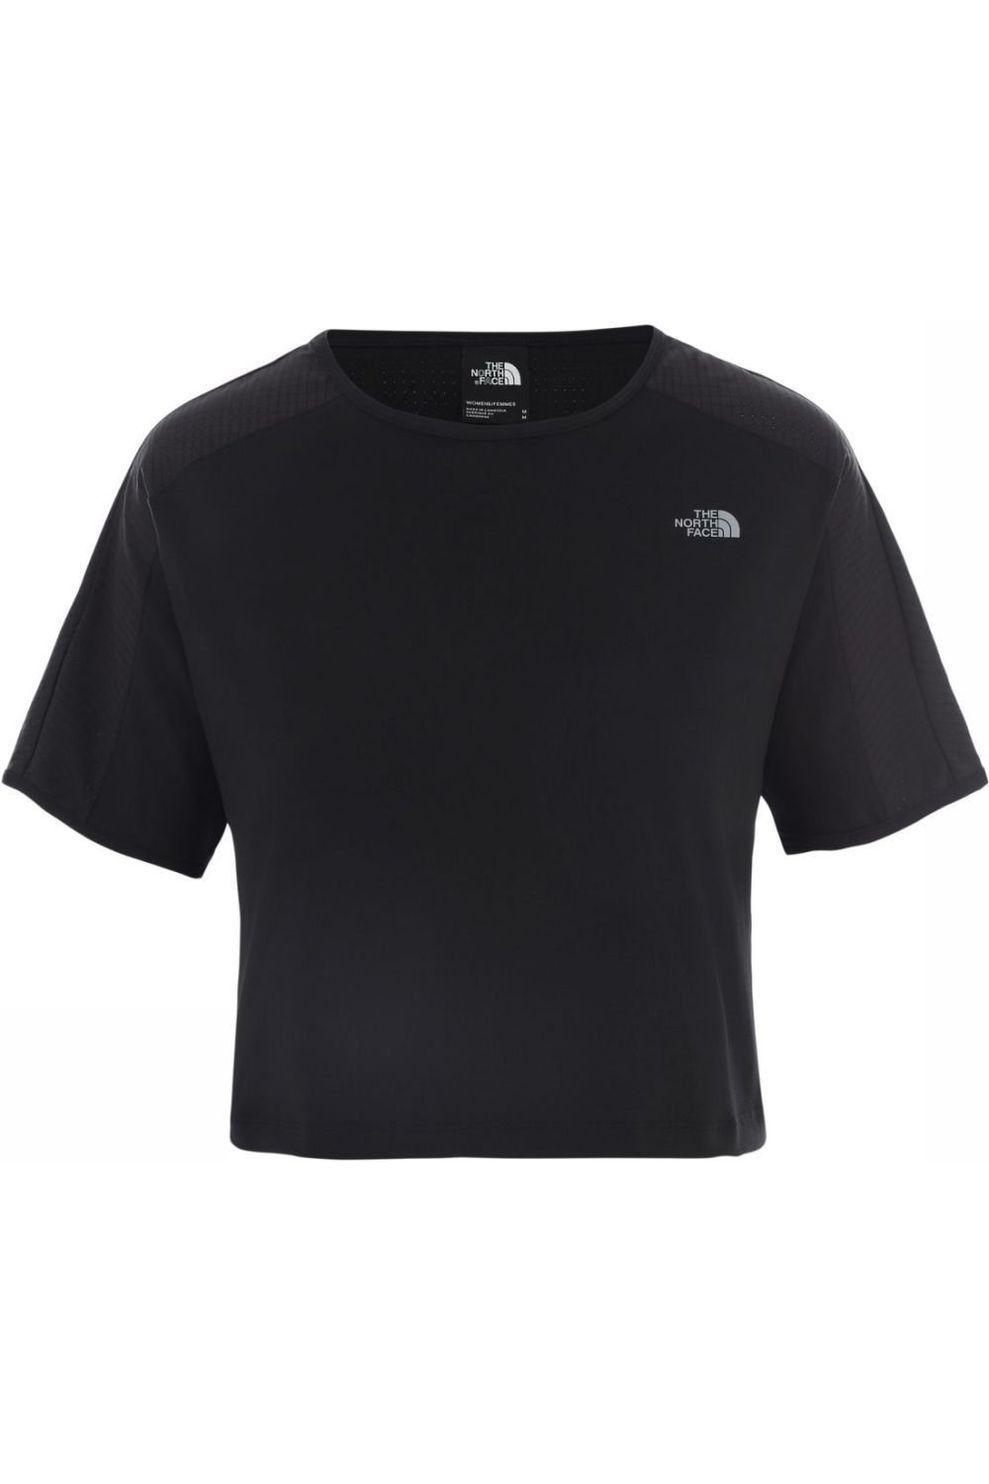 The North Face T-Shirt Women'S Active Trail S/S voor dames - Zwart - Maten: S, M, L, XL